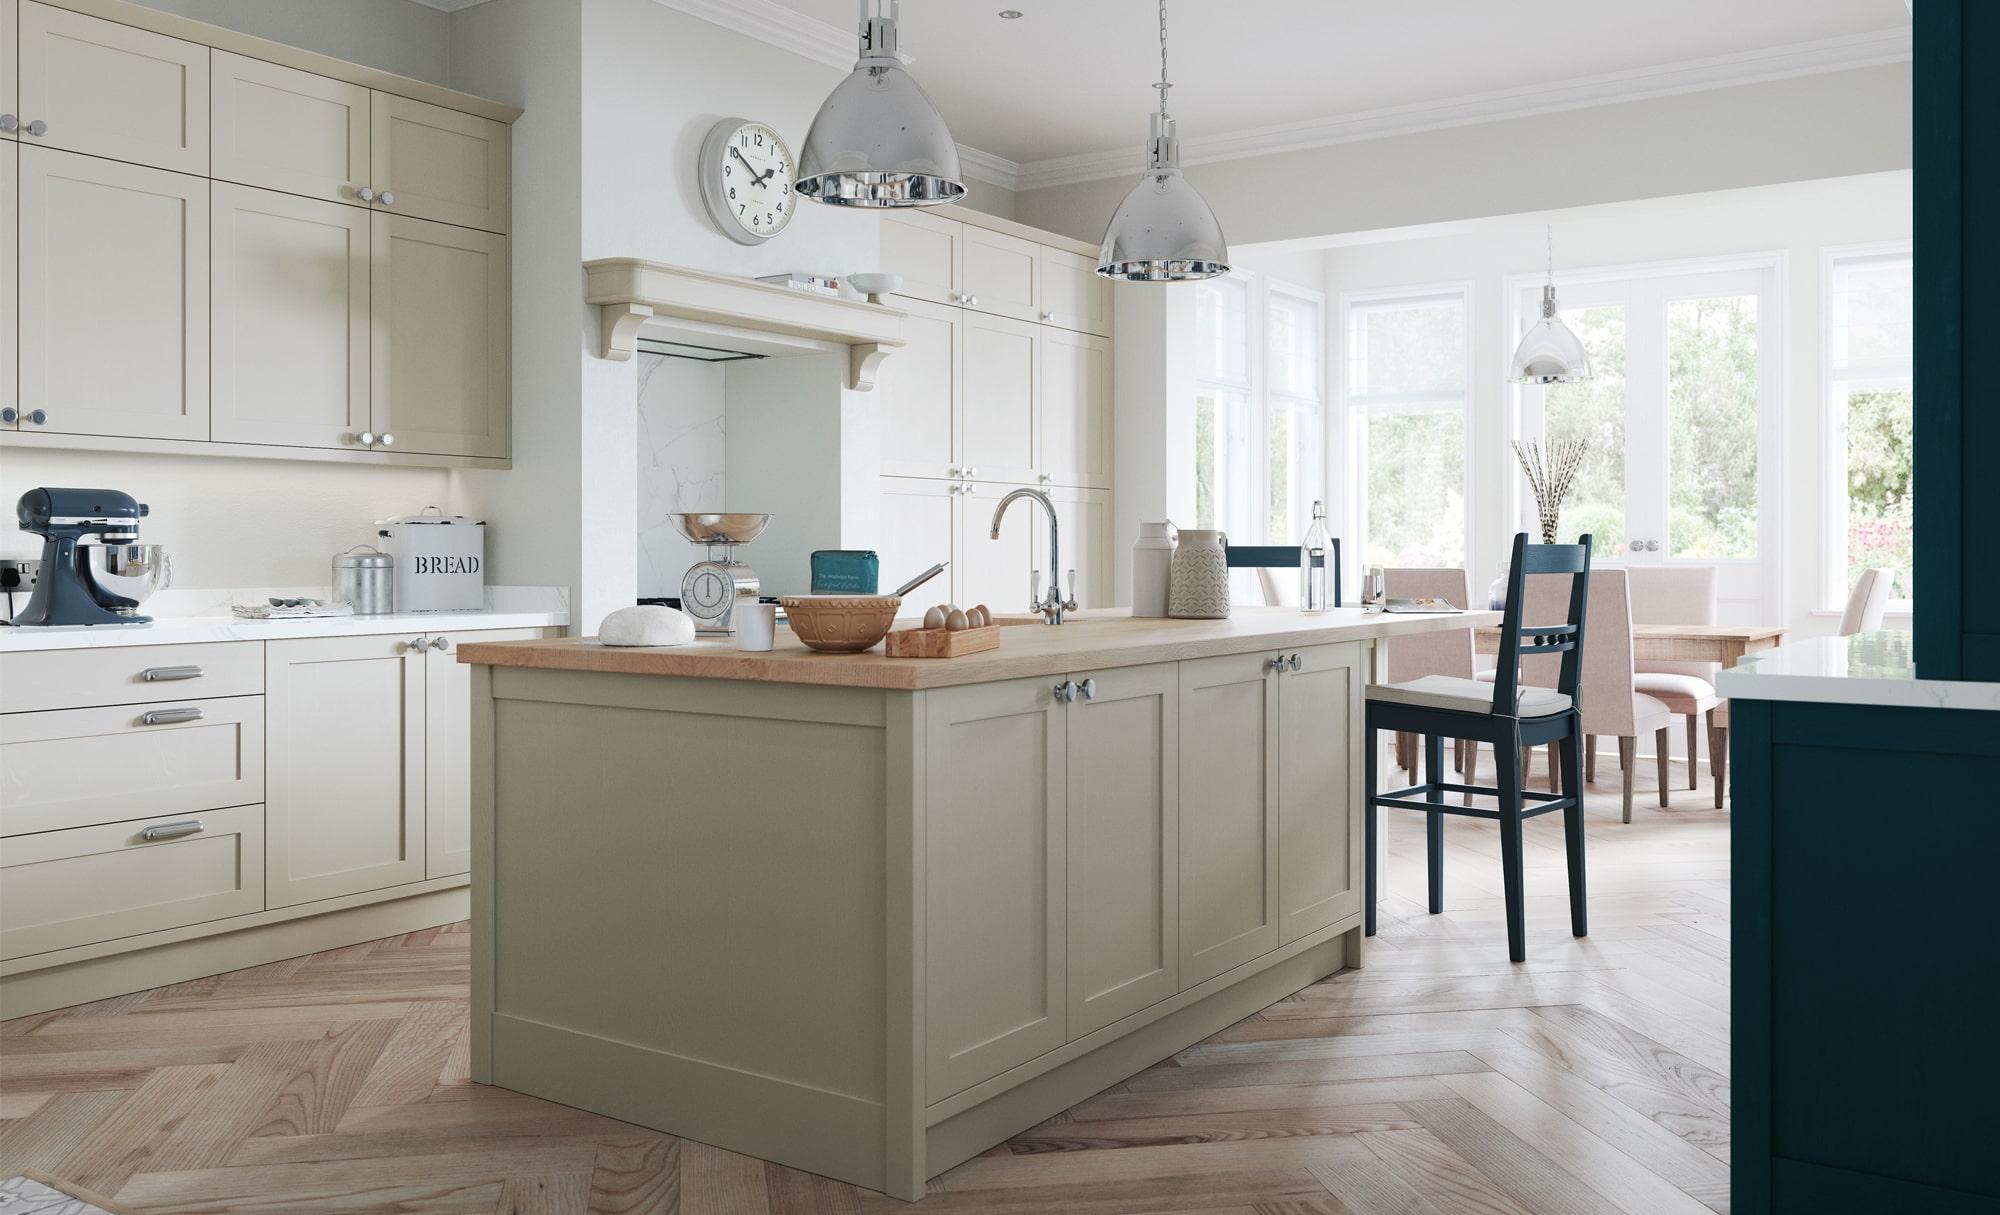 Classic Modern Aldana Shaker Style Kitchen in Painted Stone & Marine